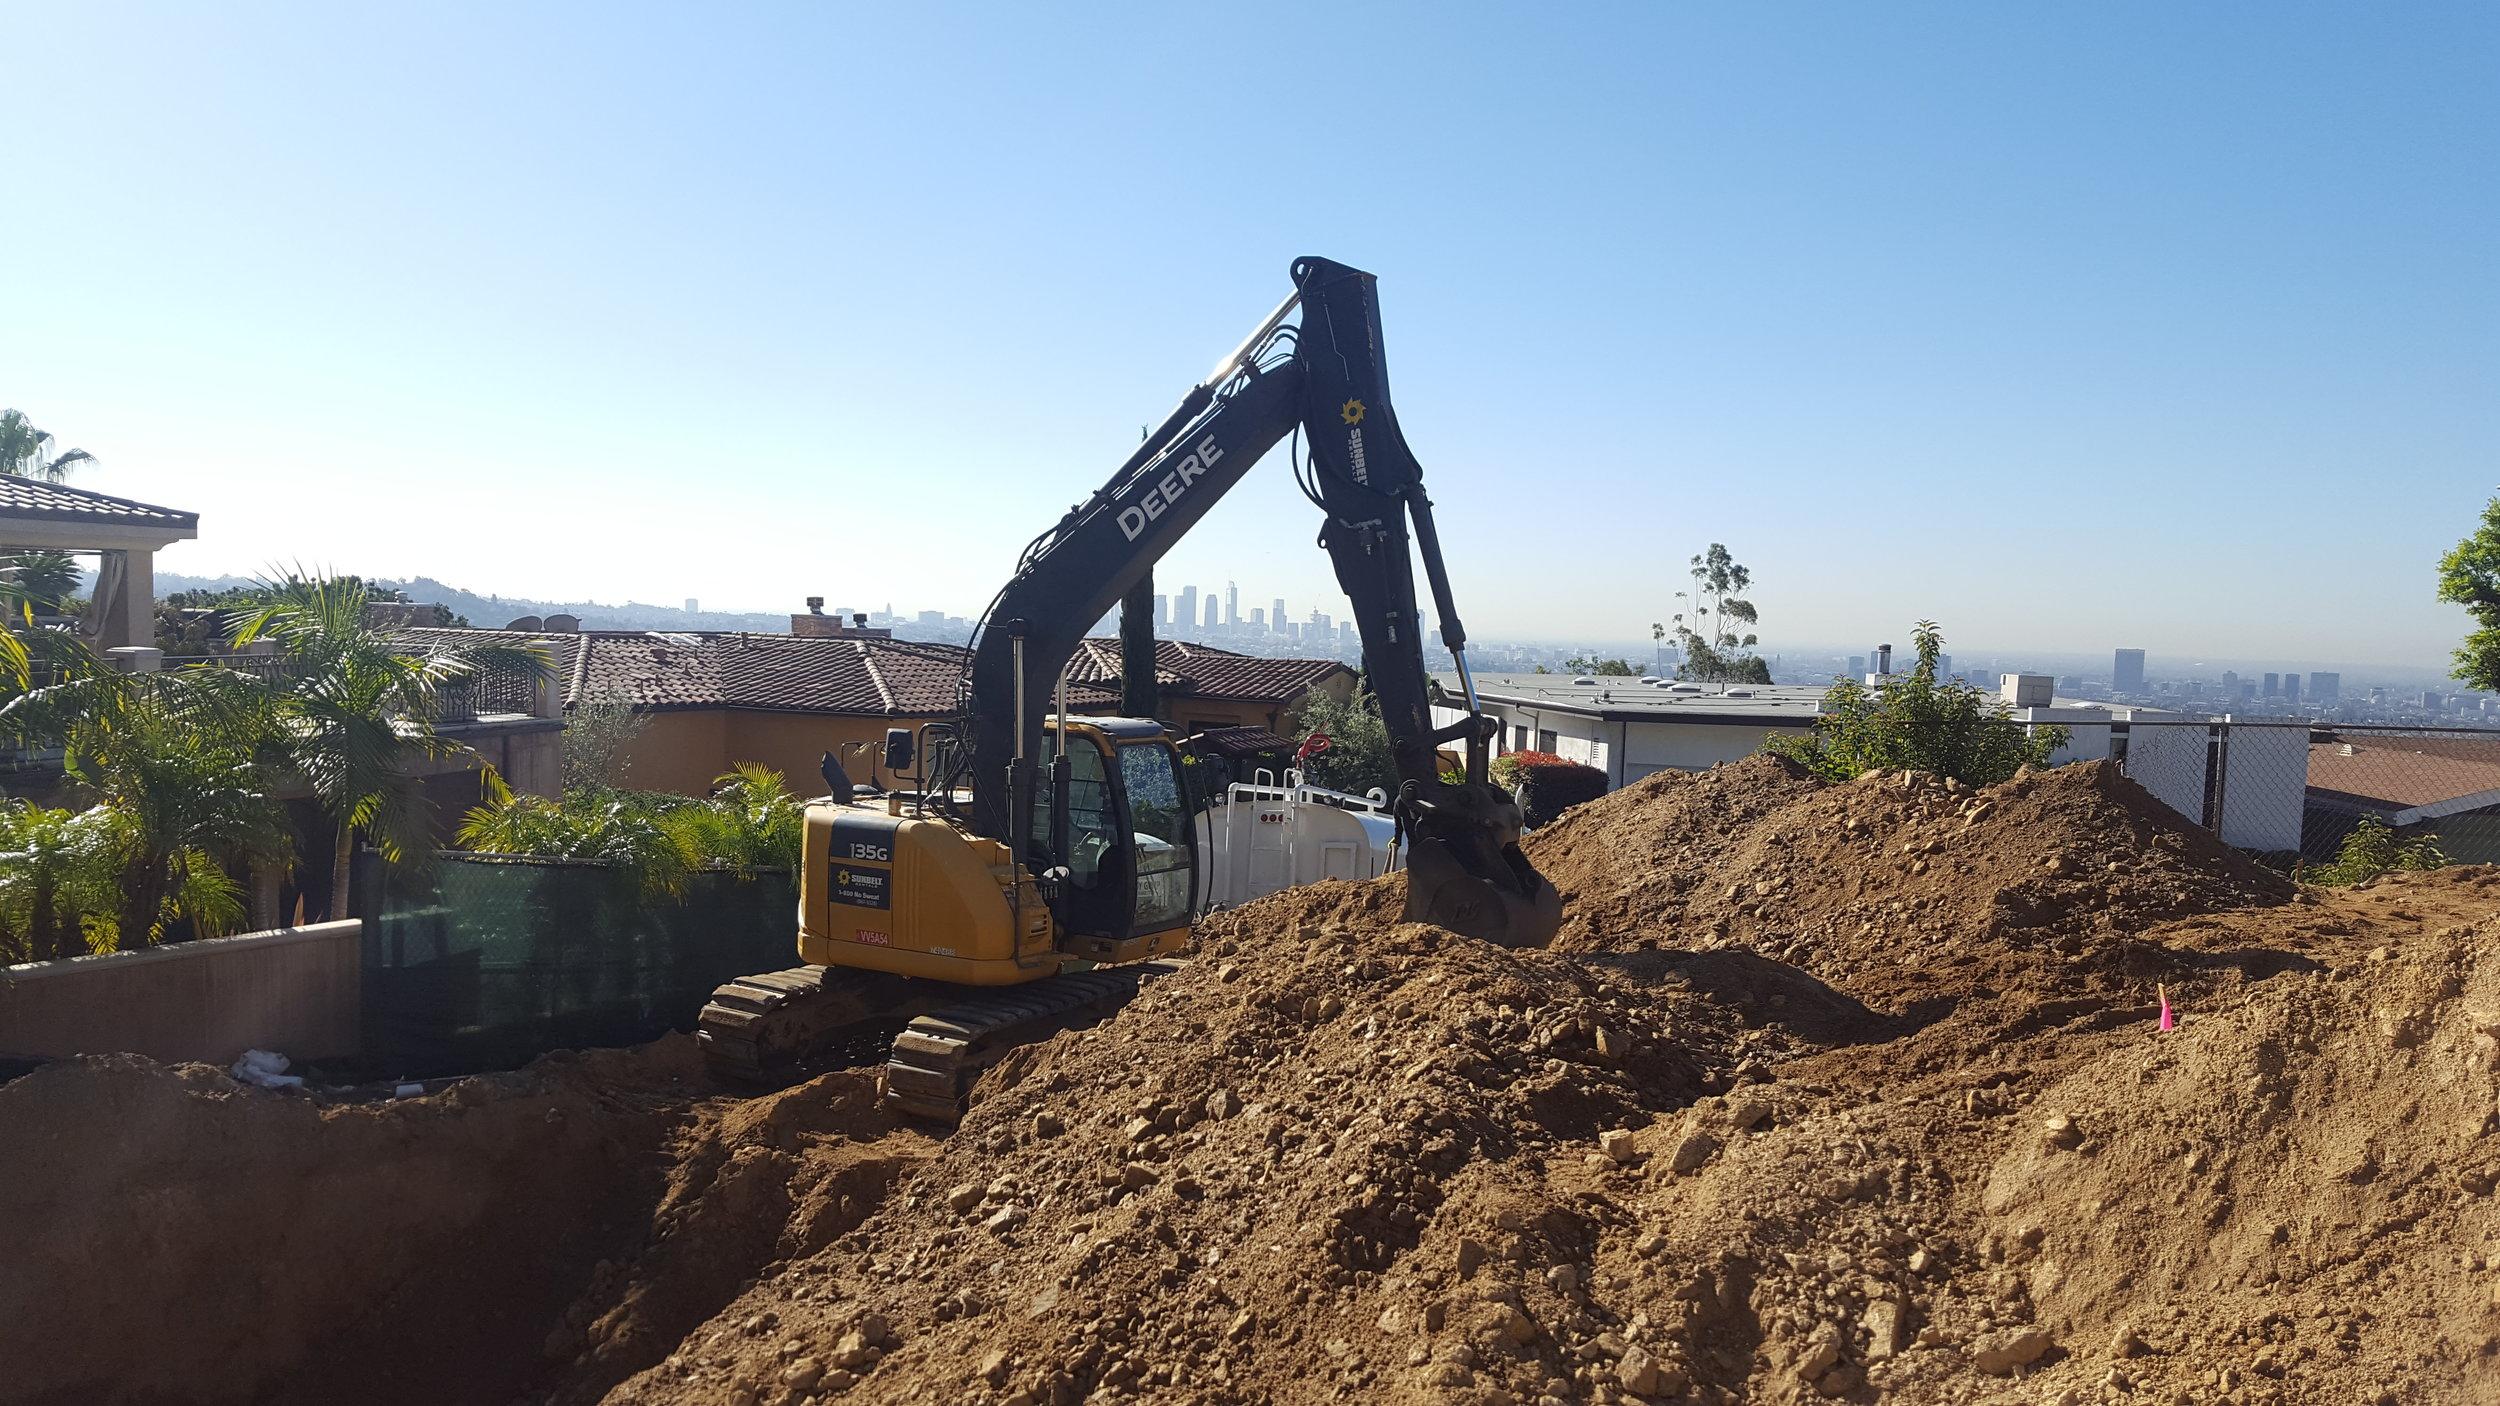 Hillside Excavation and grading project. 15 feet below grade, into Bedrock.